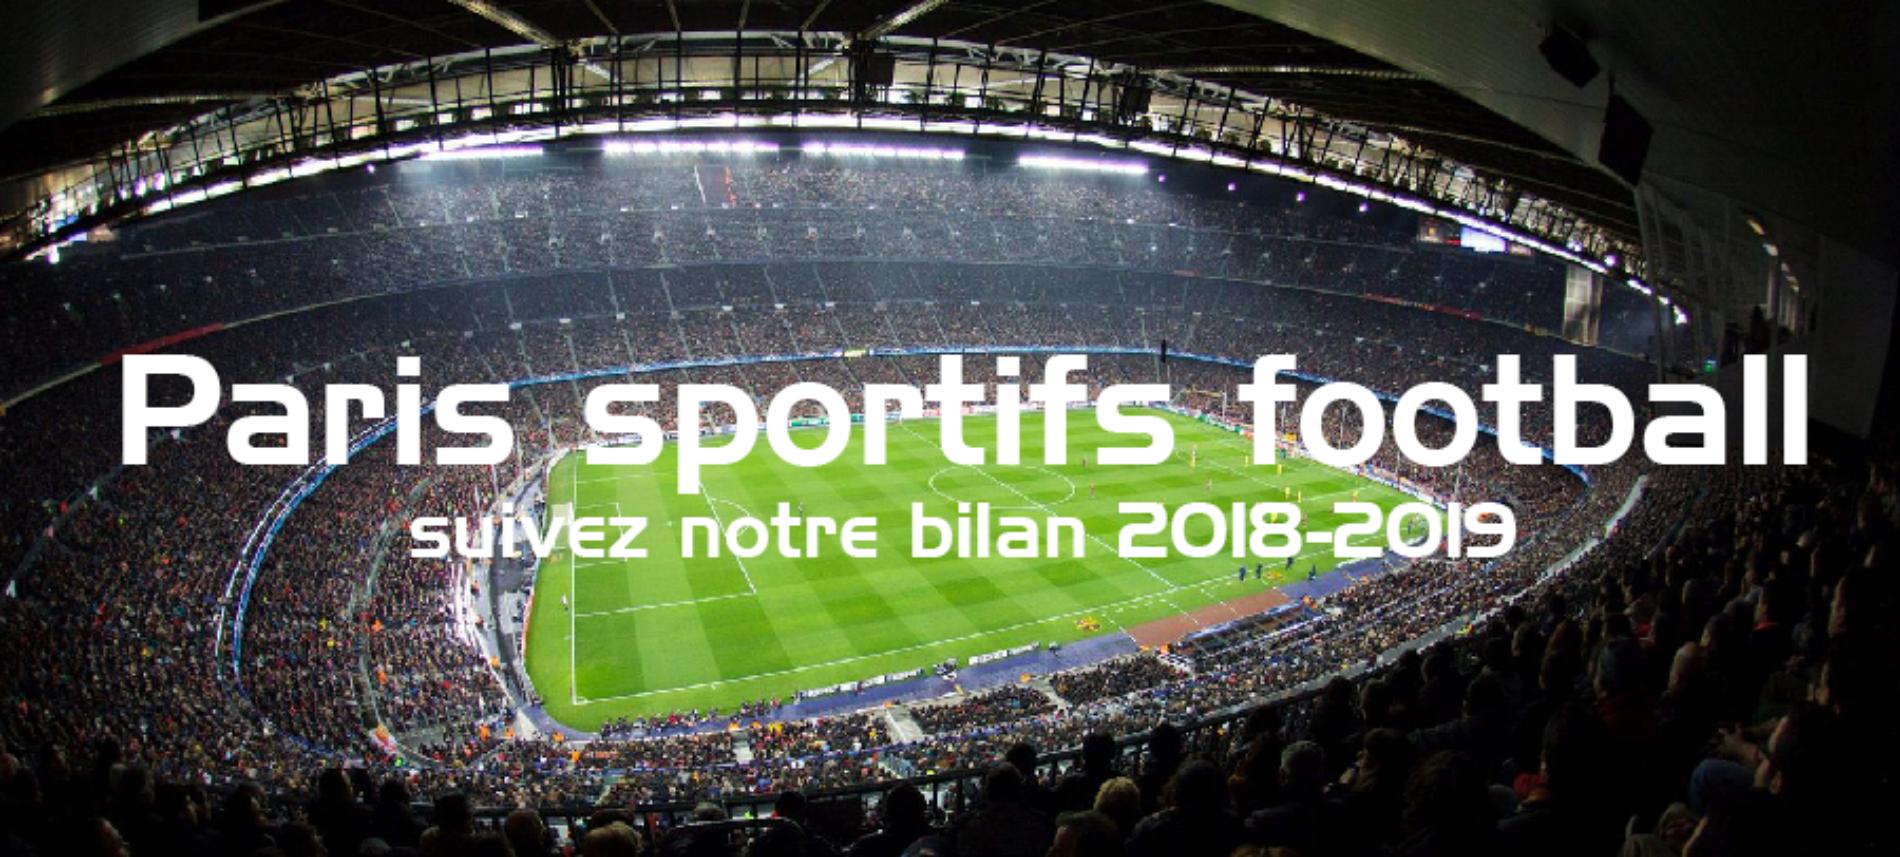 Notre bilan des paris sportifs football 2018